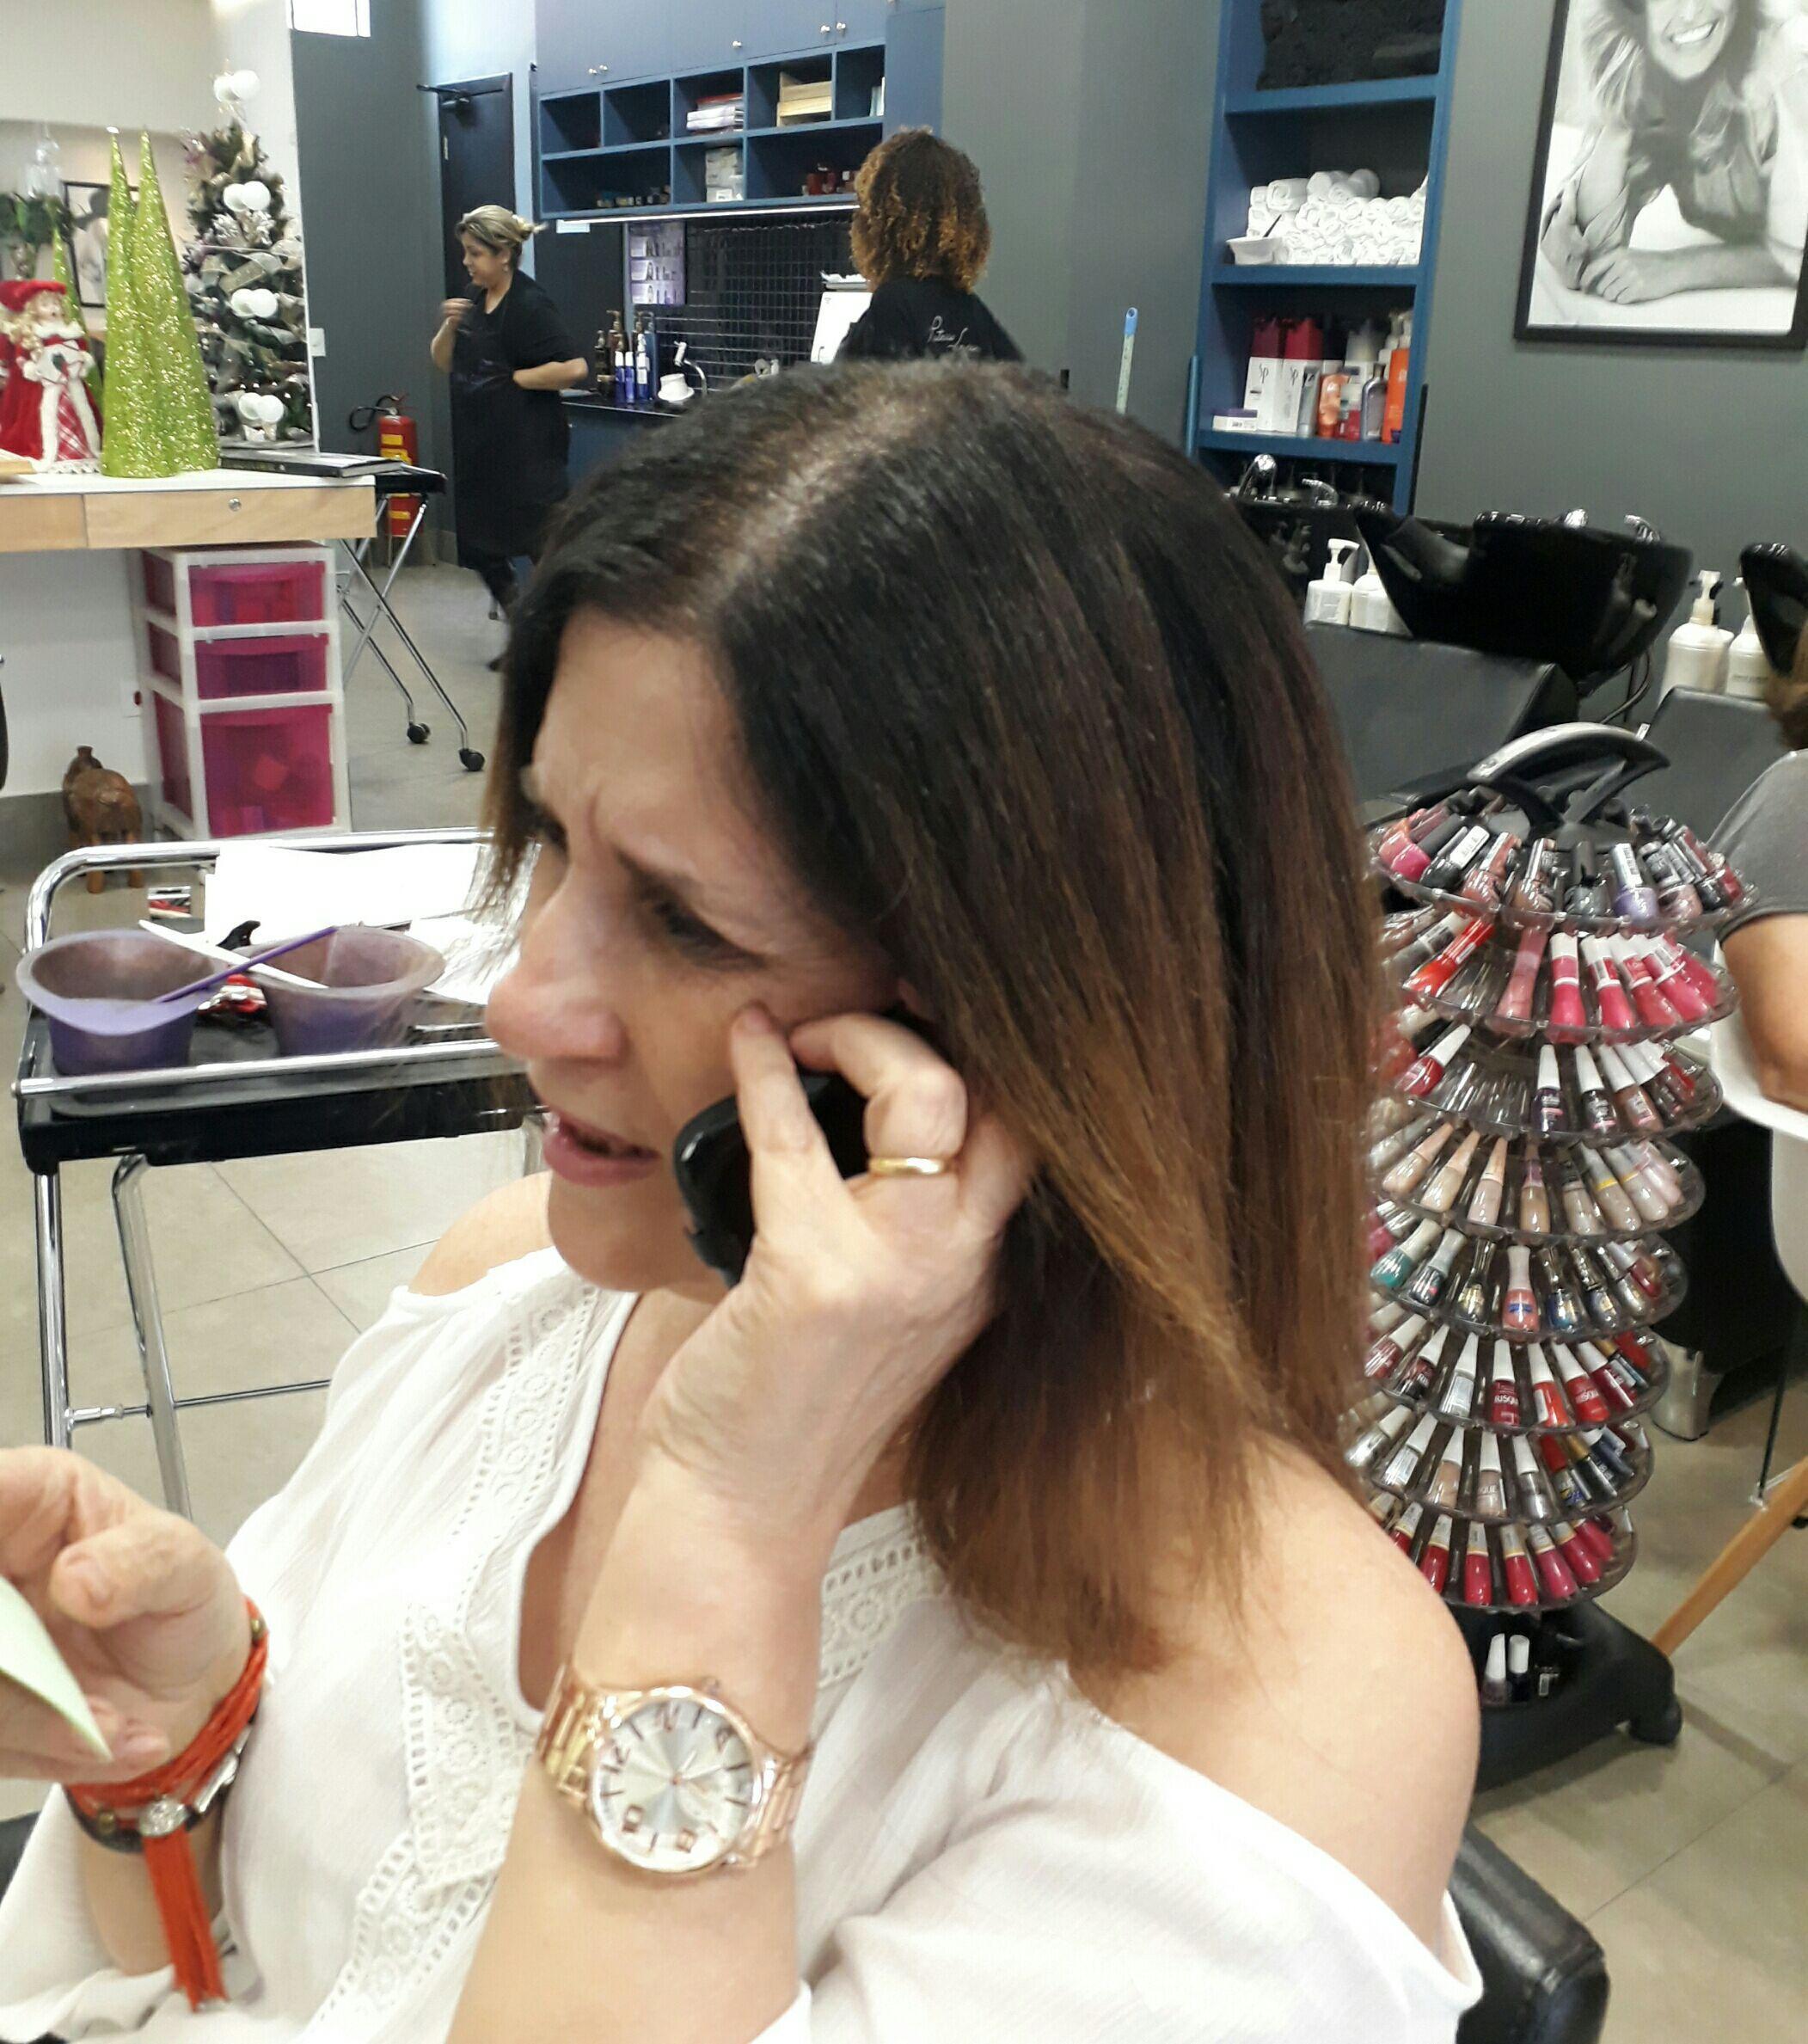 auxiliar cabeleireiro(a) auxiliar cabeleireiro(a) auxiliar cabeleireiro(a) auxiliar cabeleireiro(a) auxiliar cabeleireiro(a) auxiliar cabeleireiro(a)